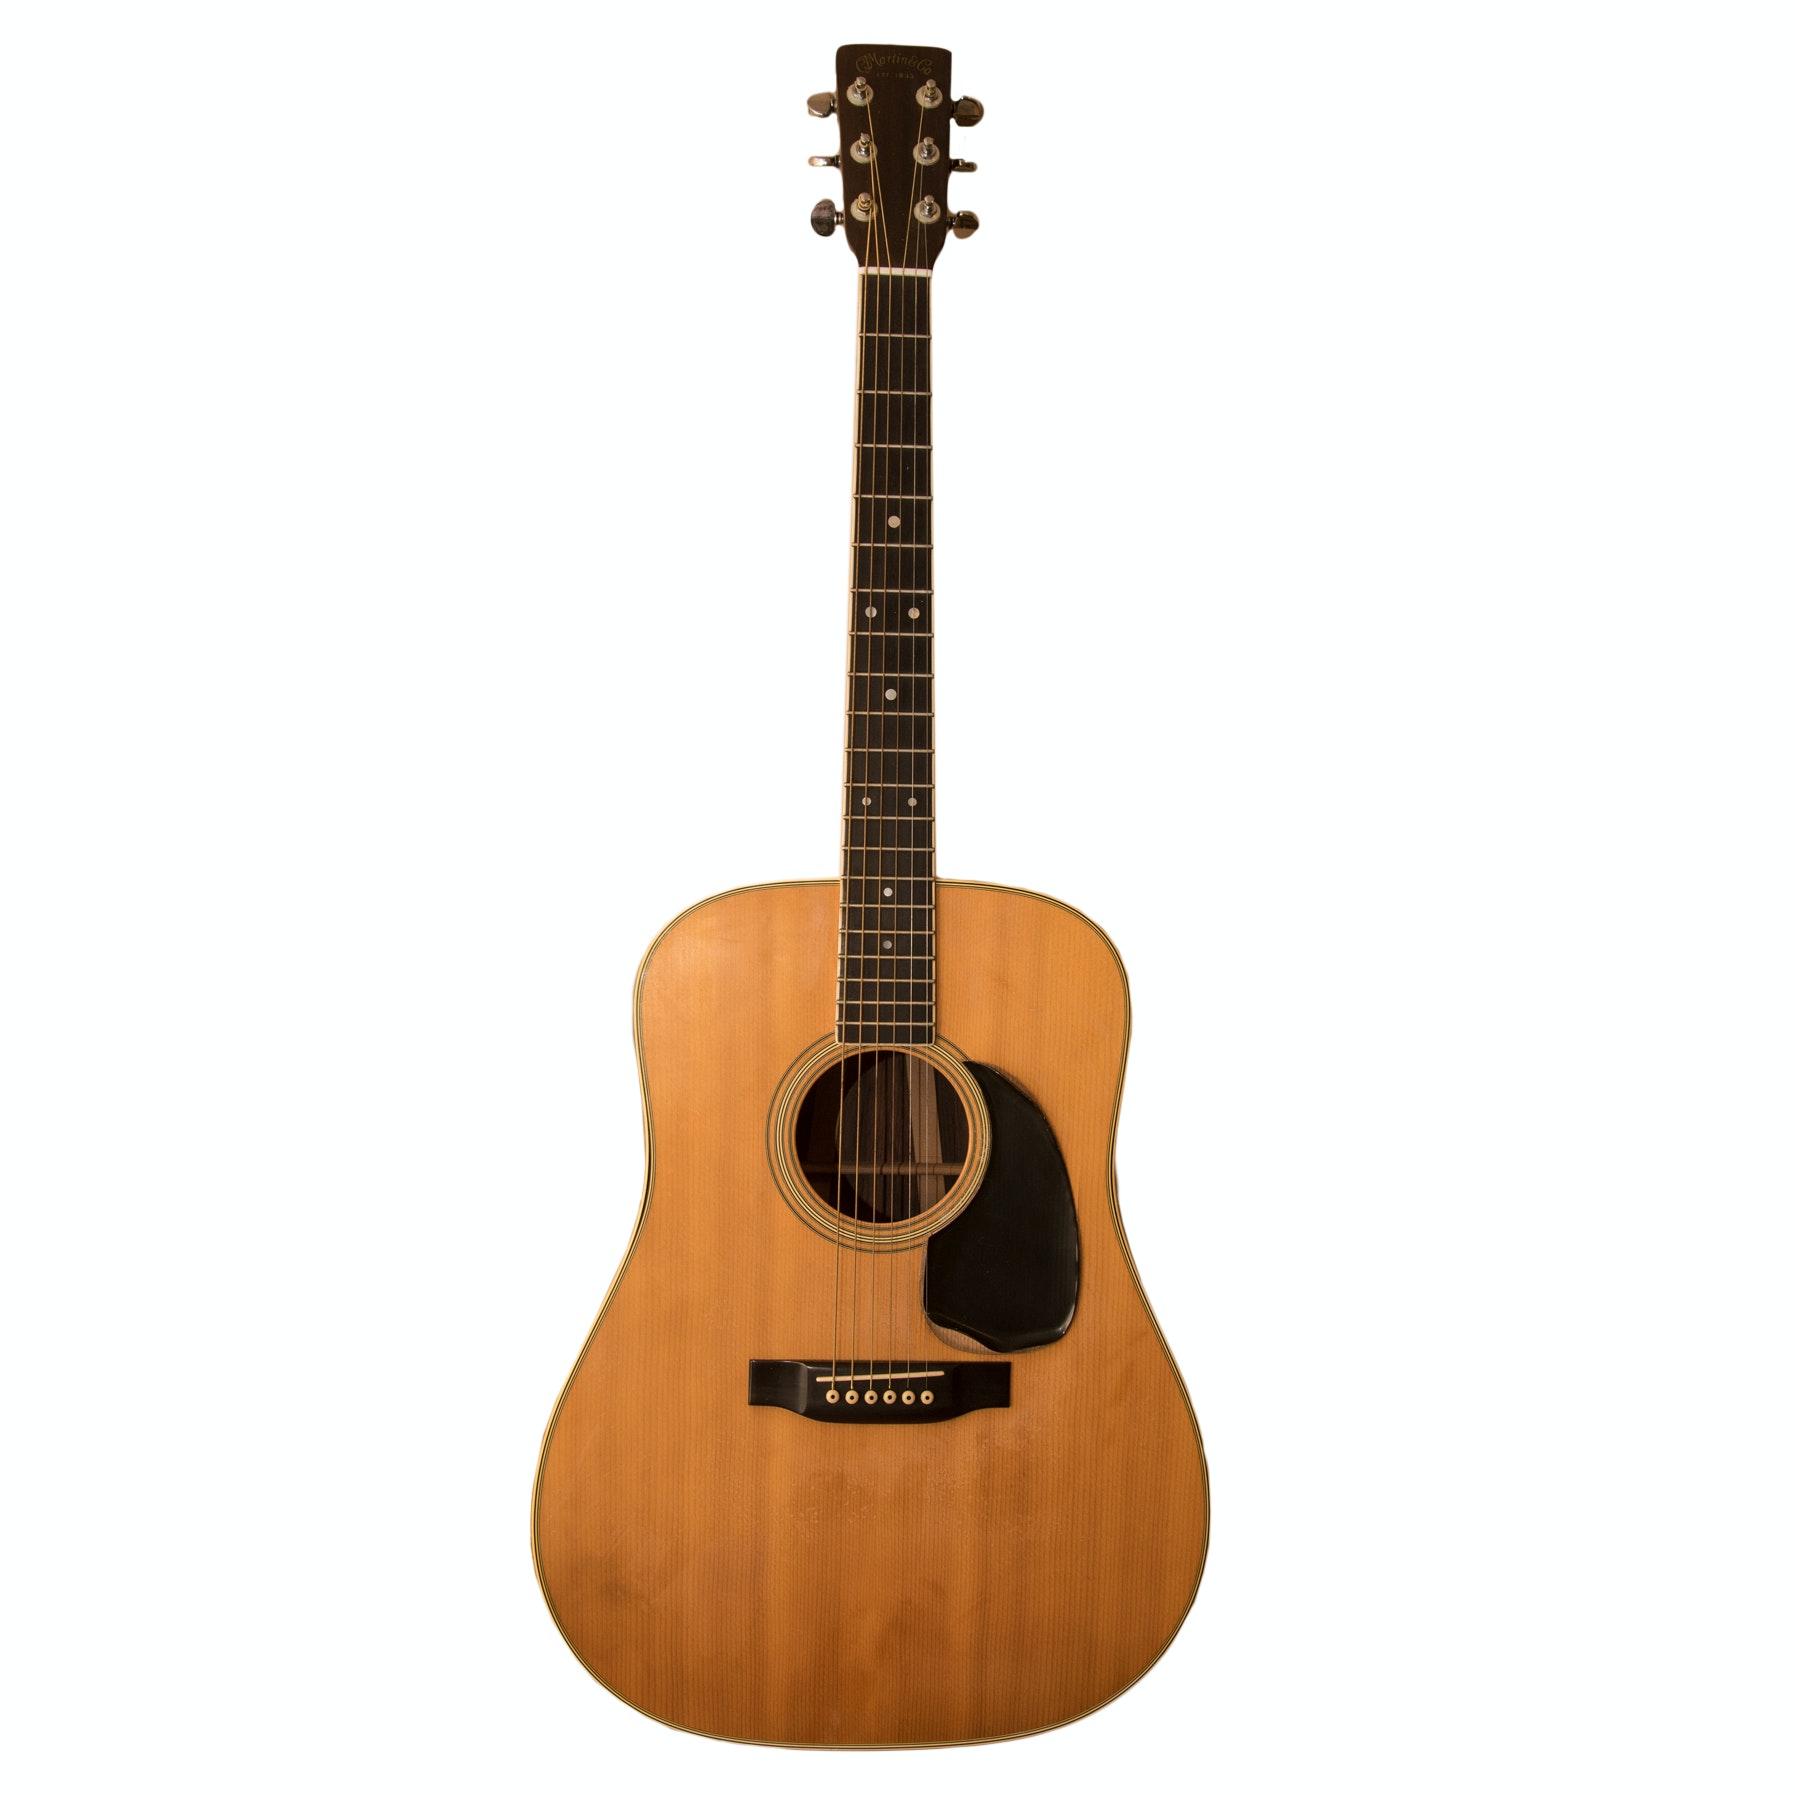 1973 C.F. Martin D-35 Dreadnought Acoustic Guitar